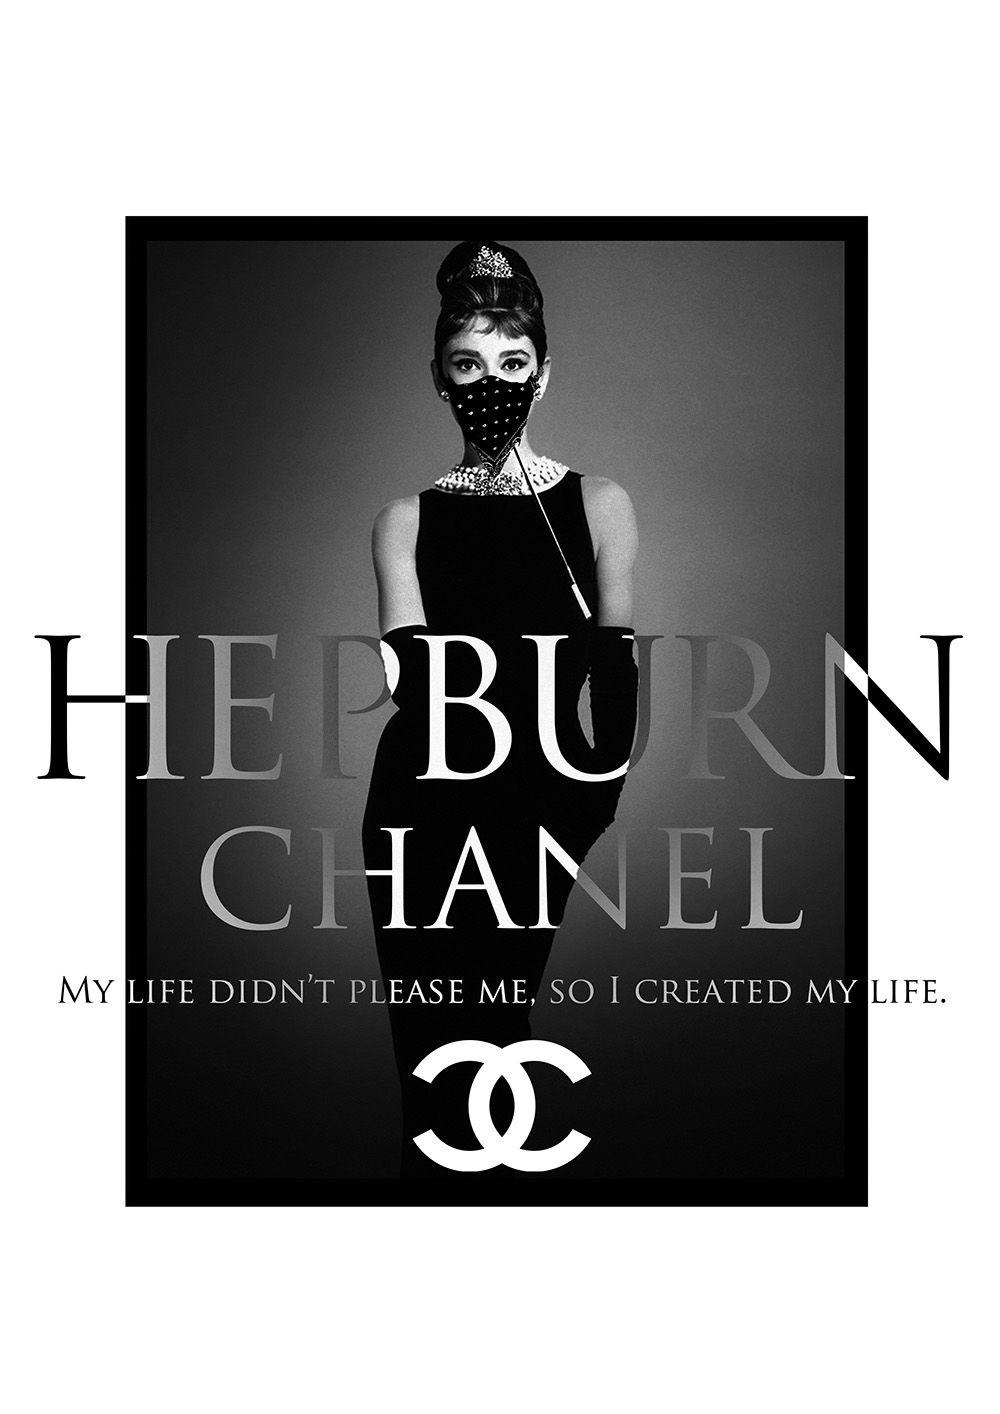 Chanel Audrey Hepburn オードリー ヘップバーン キャンバスアート